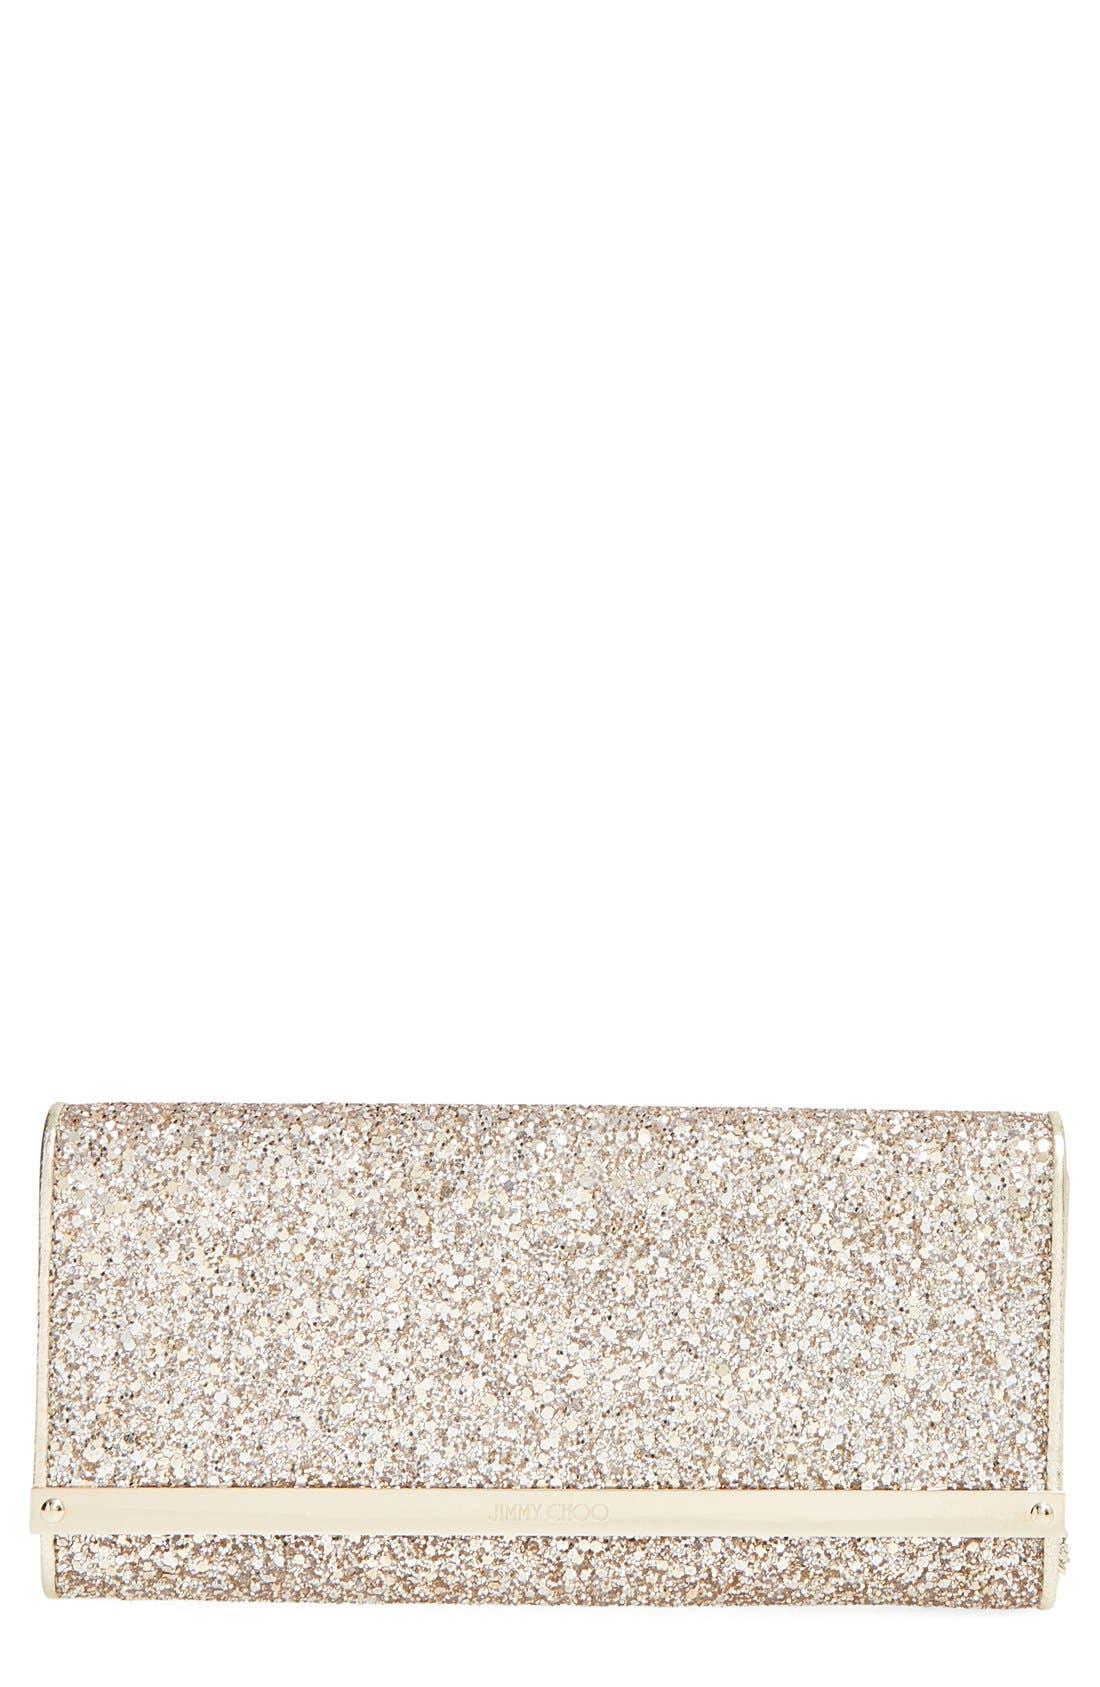 JIMMY CHOO 'Milla' Glitter Clutch, Main, color, 250